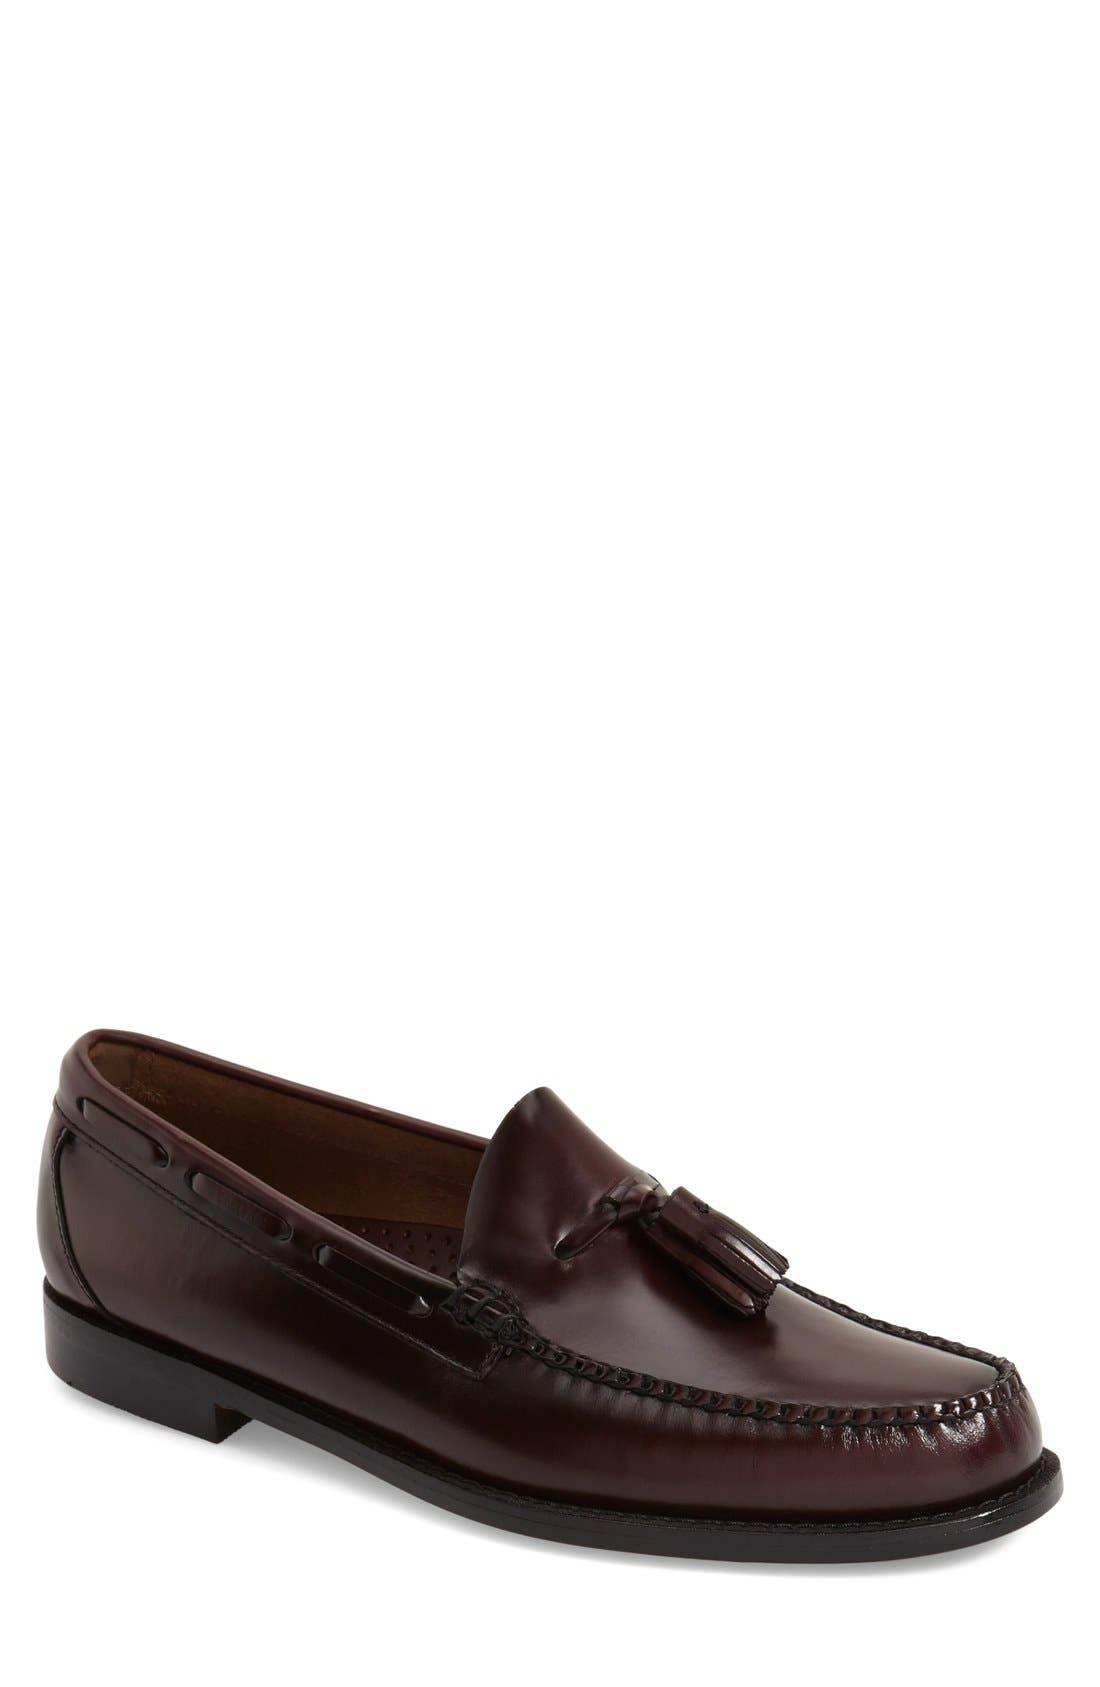 G.H. Bass & Co. 'Lexington - Weejuns' Tassel Loafer (Men)